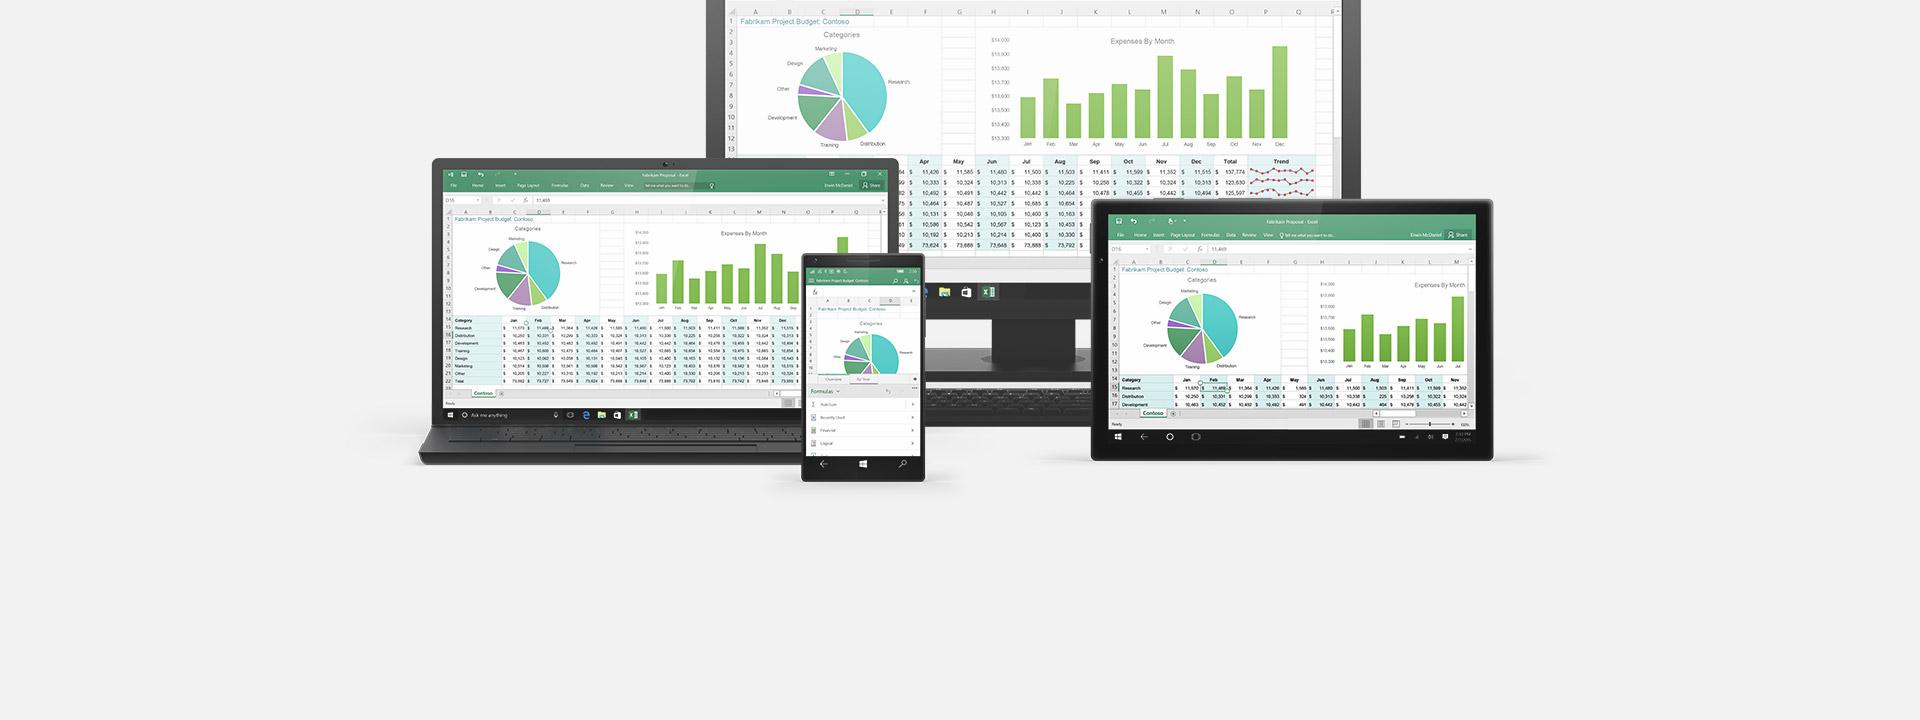 Múltiples dispositivos, más información sobre Office 365